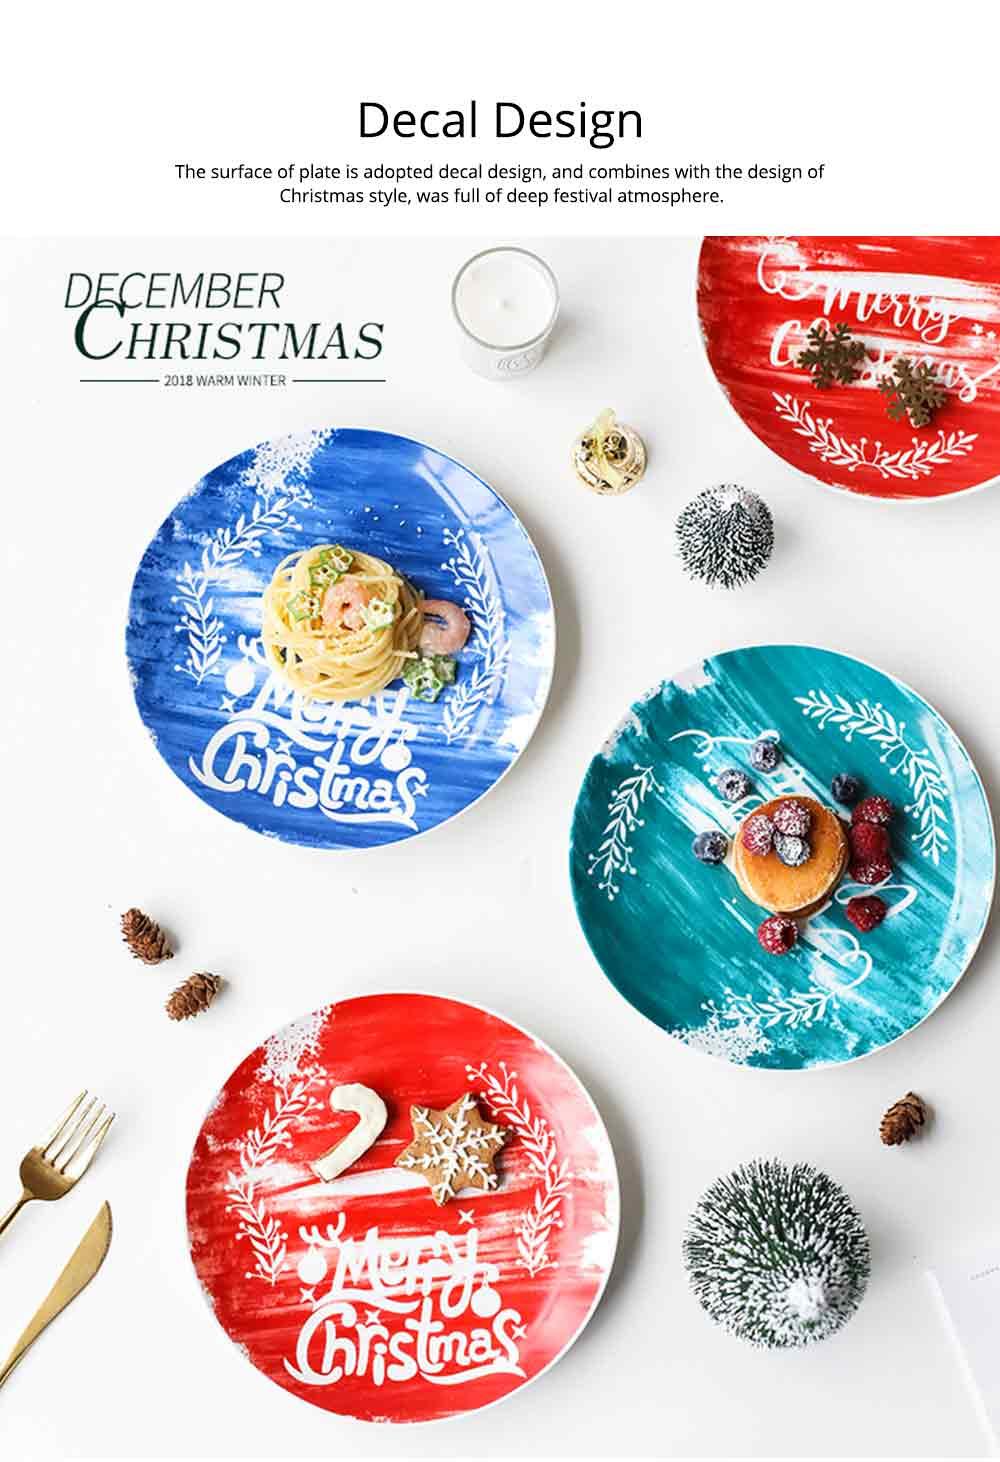 Christmas Painted Ceramic Plates, Christmas Style Steak Dinner Plates 2